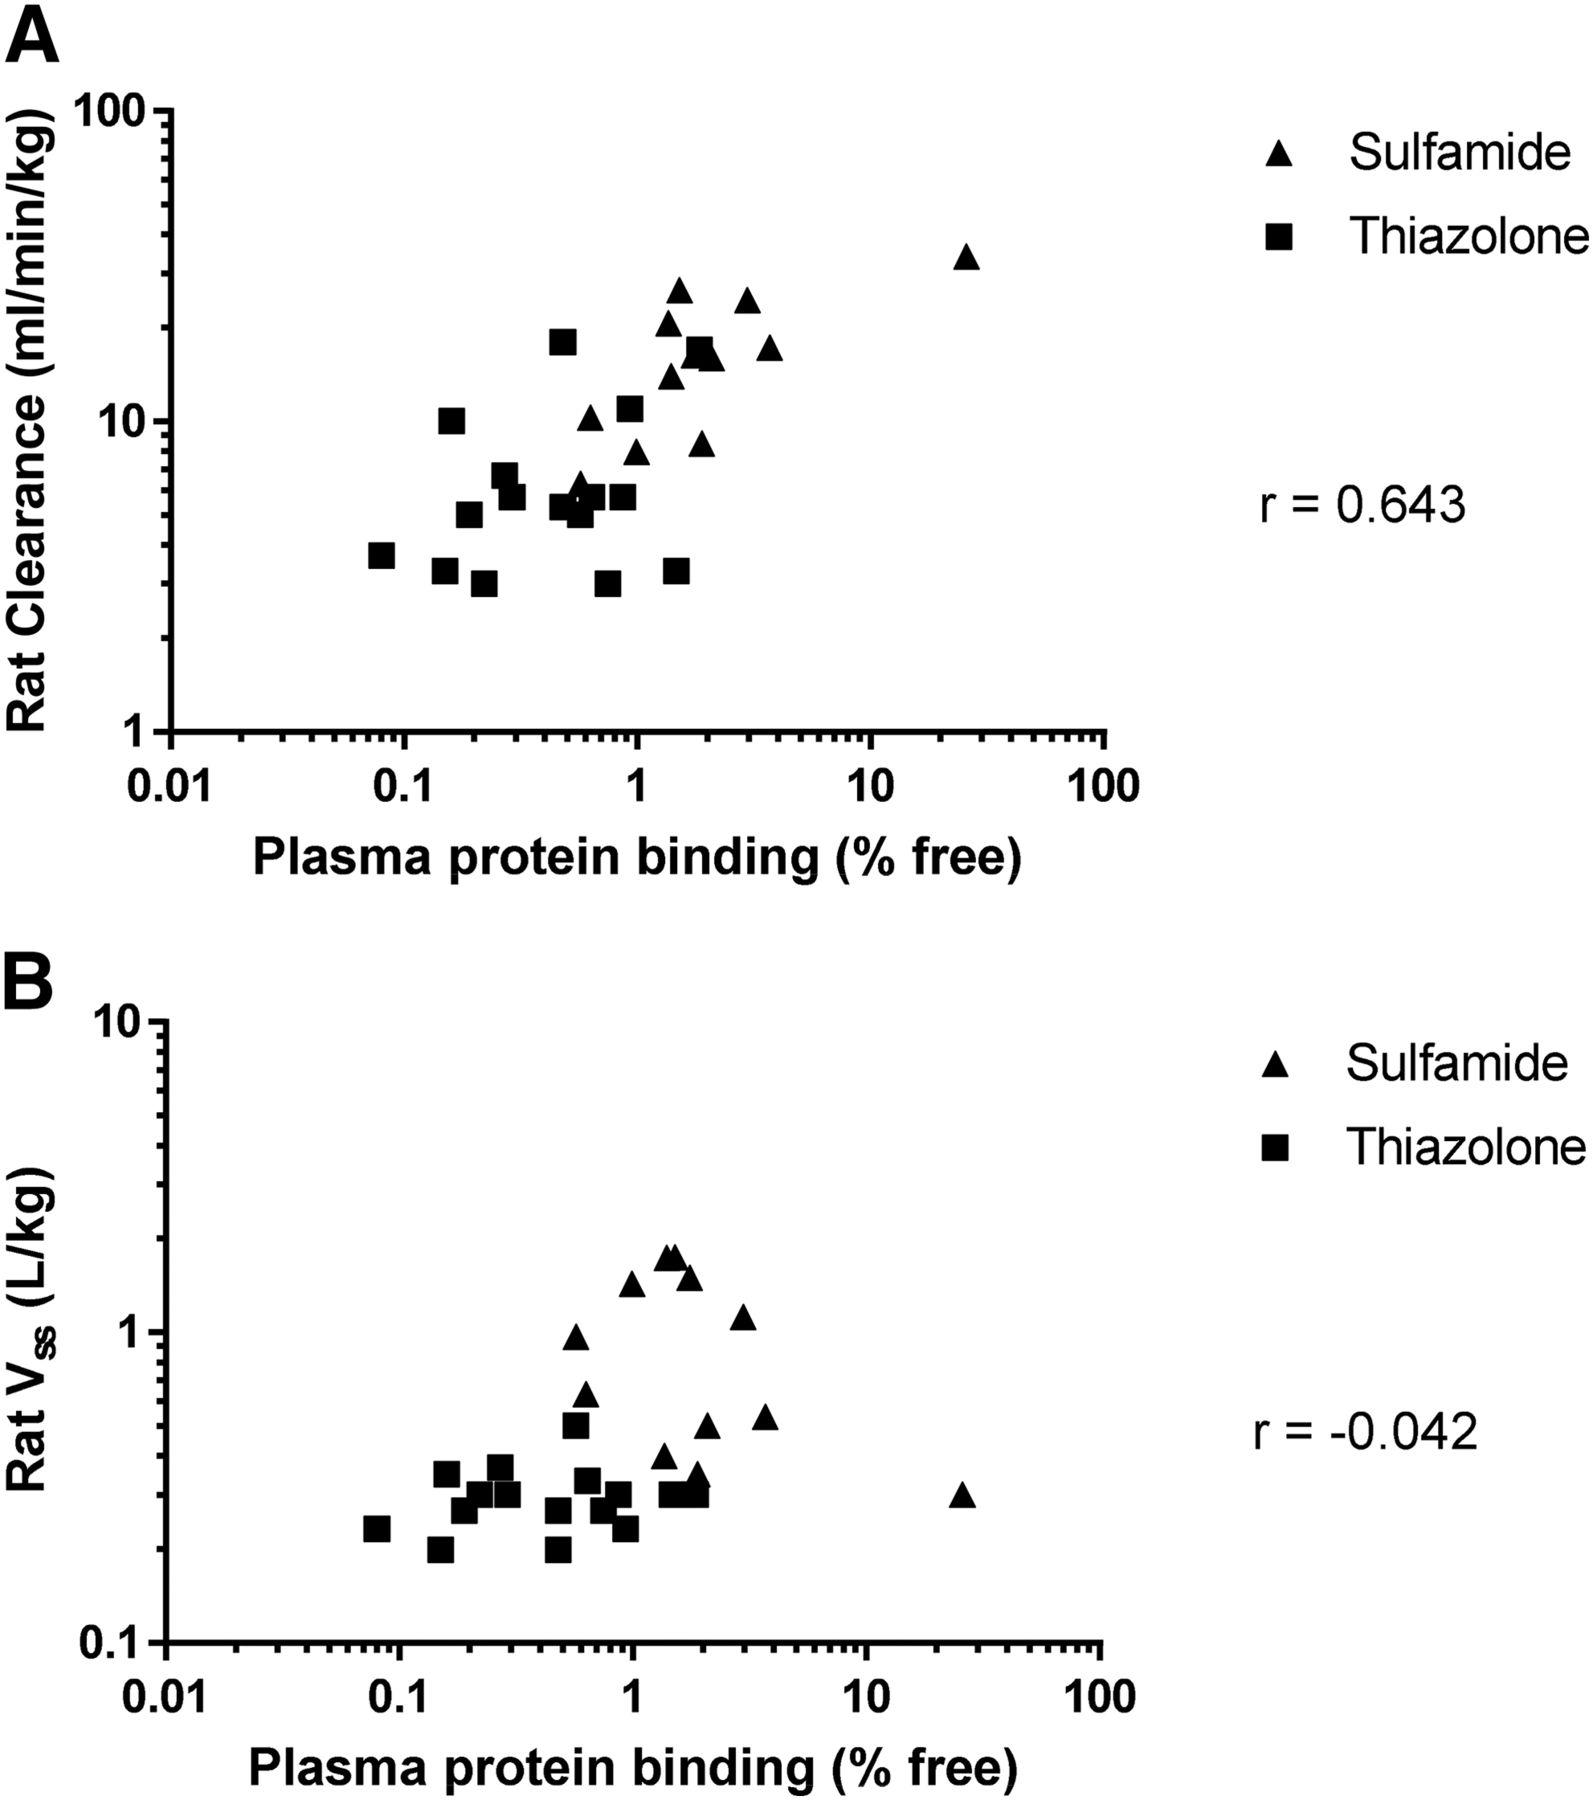 Plasma Protein Binding As An Optimizable Parameter For